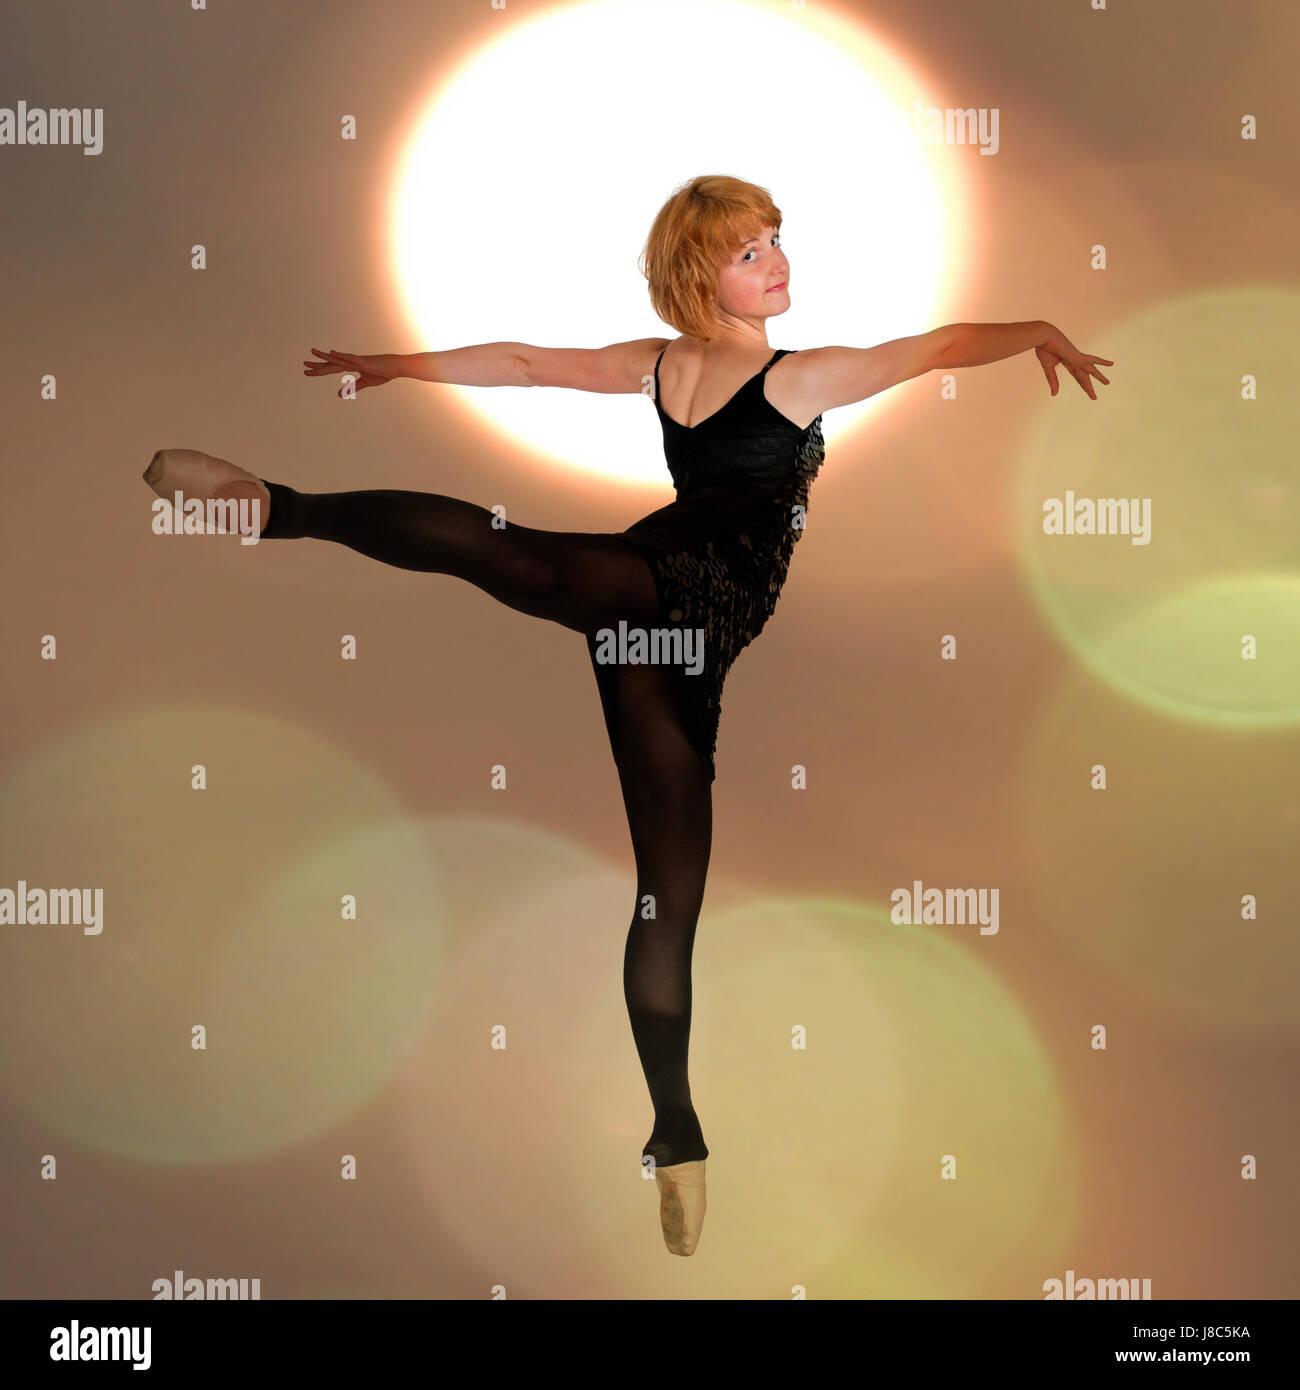 Female Ballet Dancer balances on her tows Digitally enhanced photograph - Stock Image